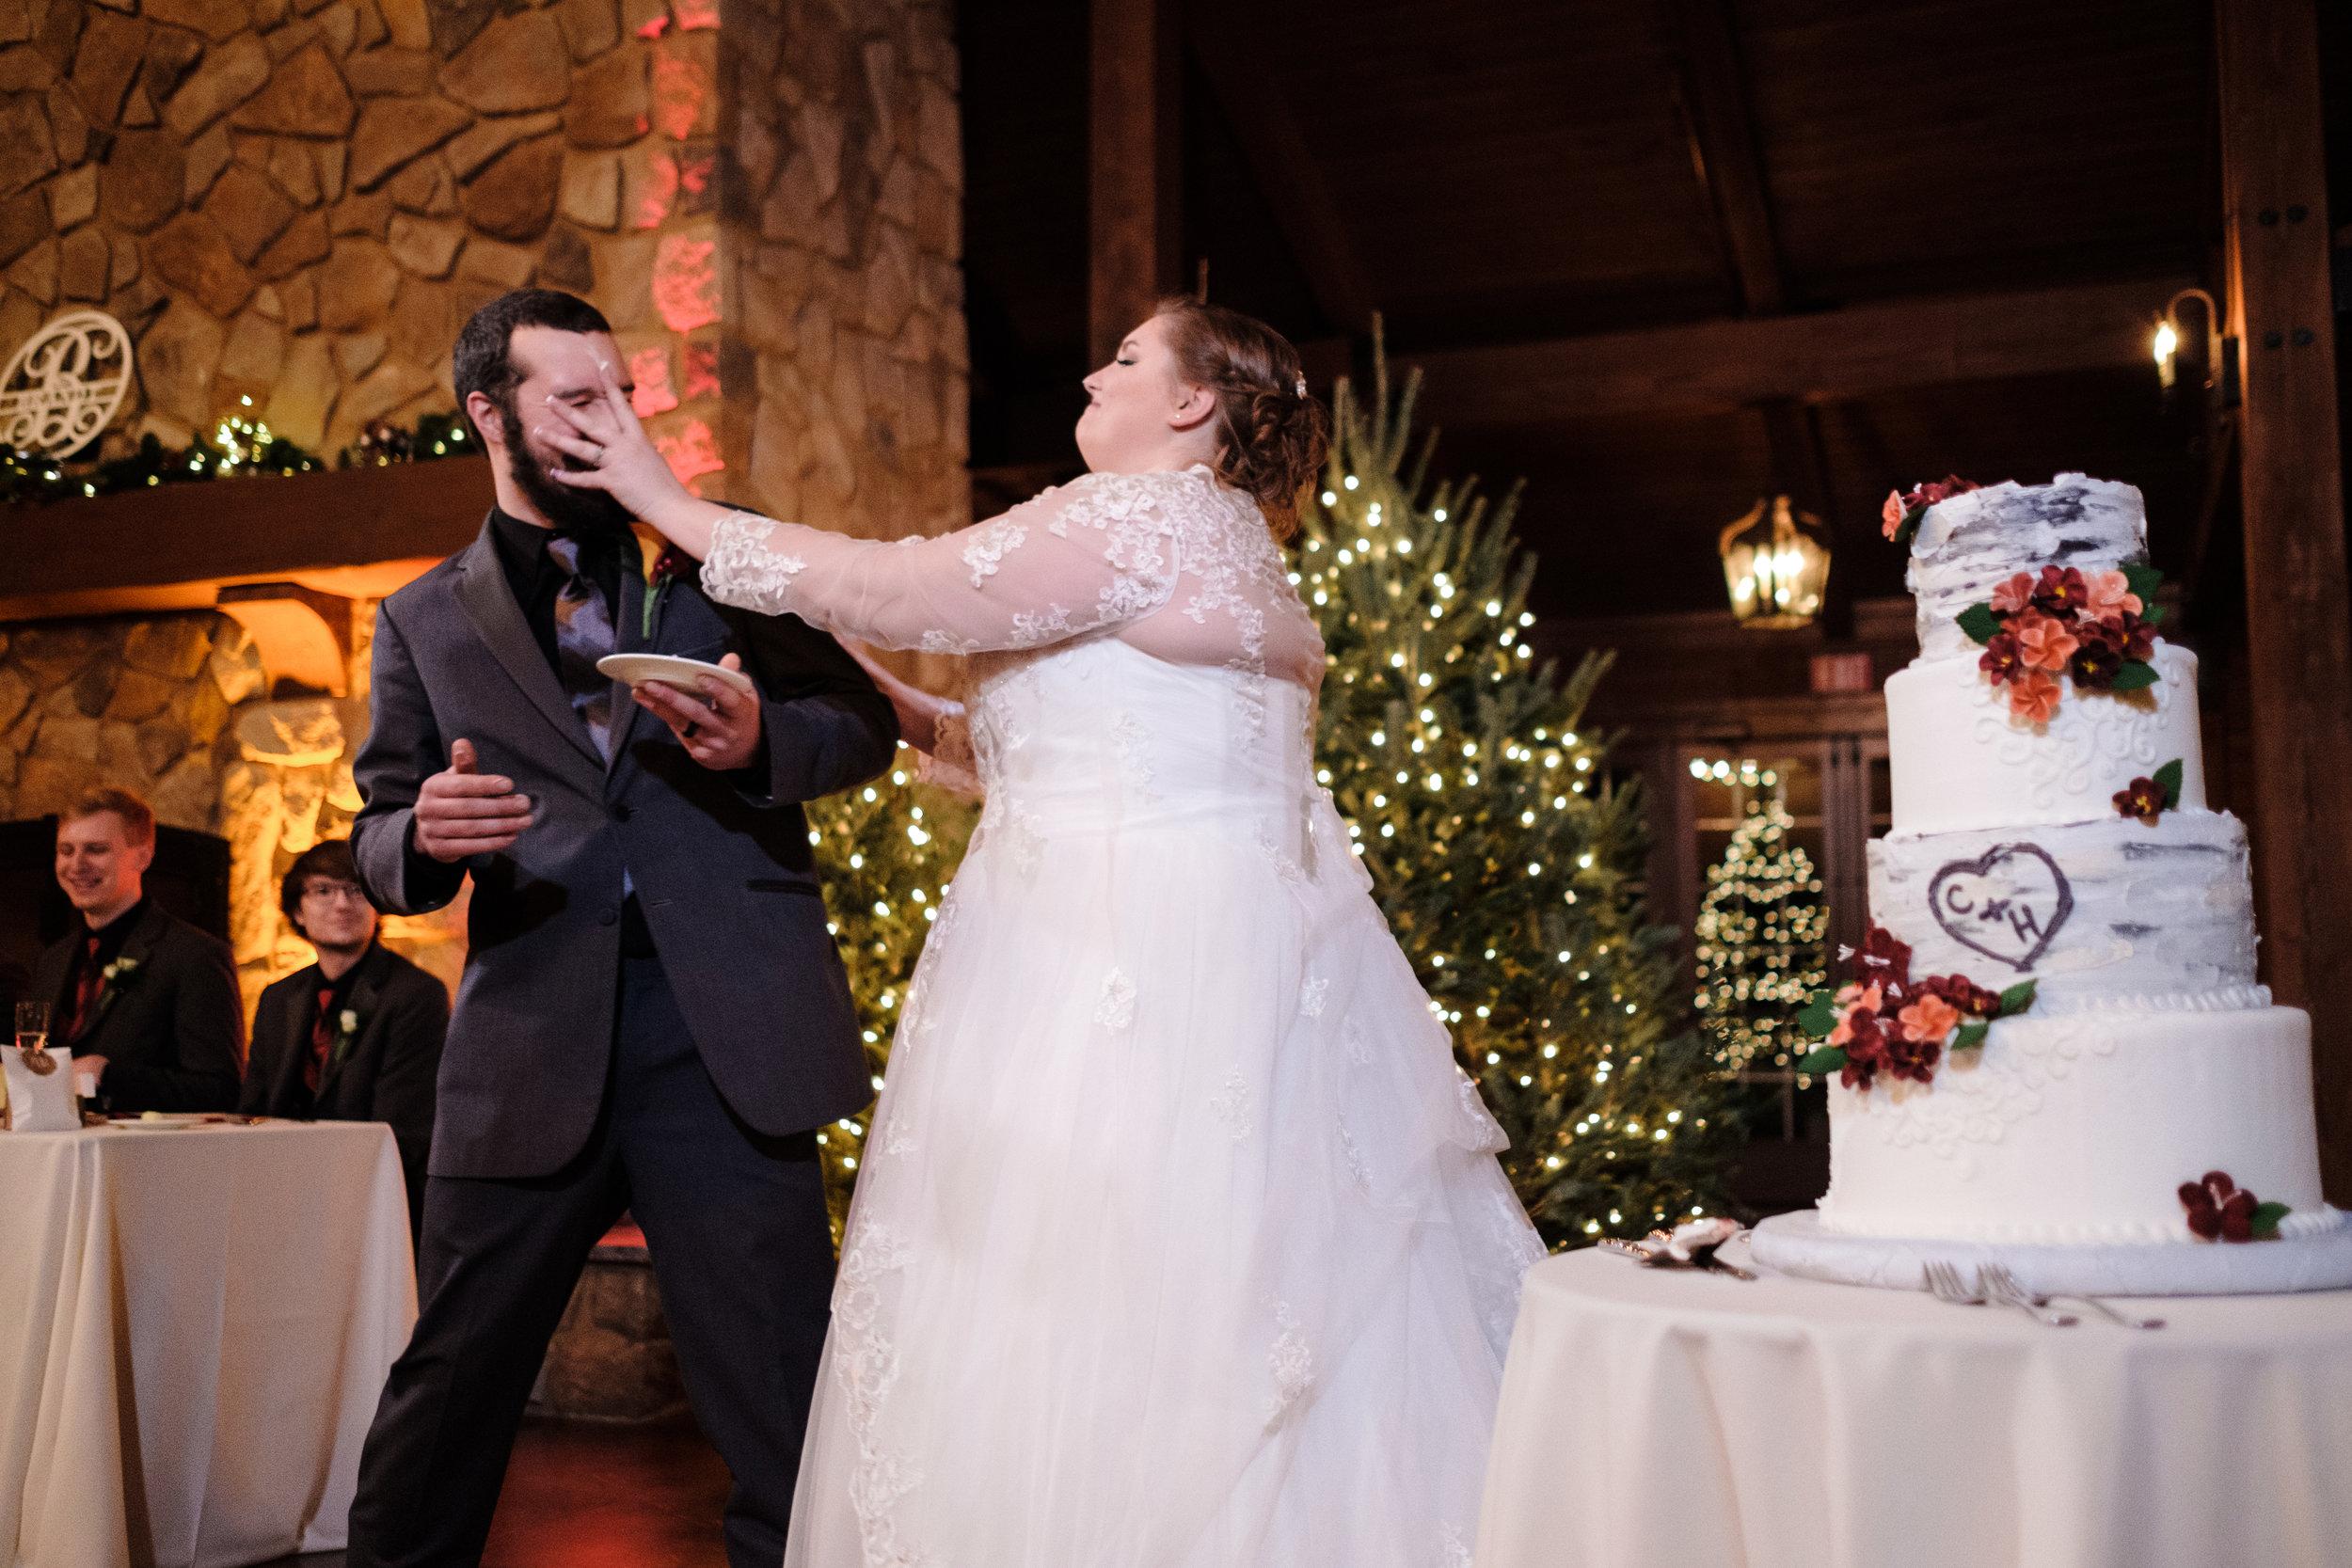 18-12-28 Corinne-Henry-Pavilion-Wedding-459.jpg